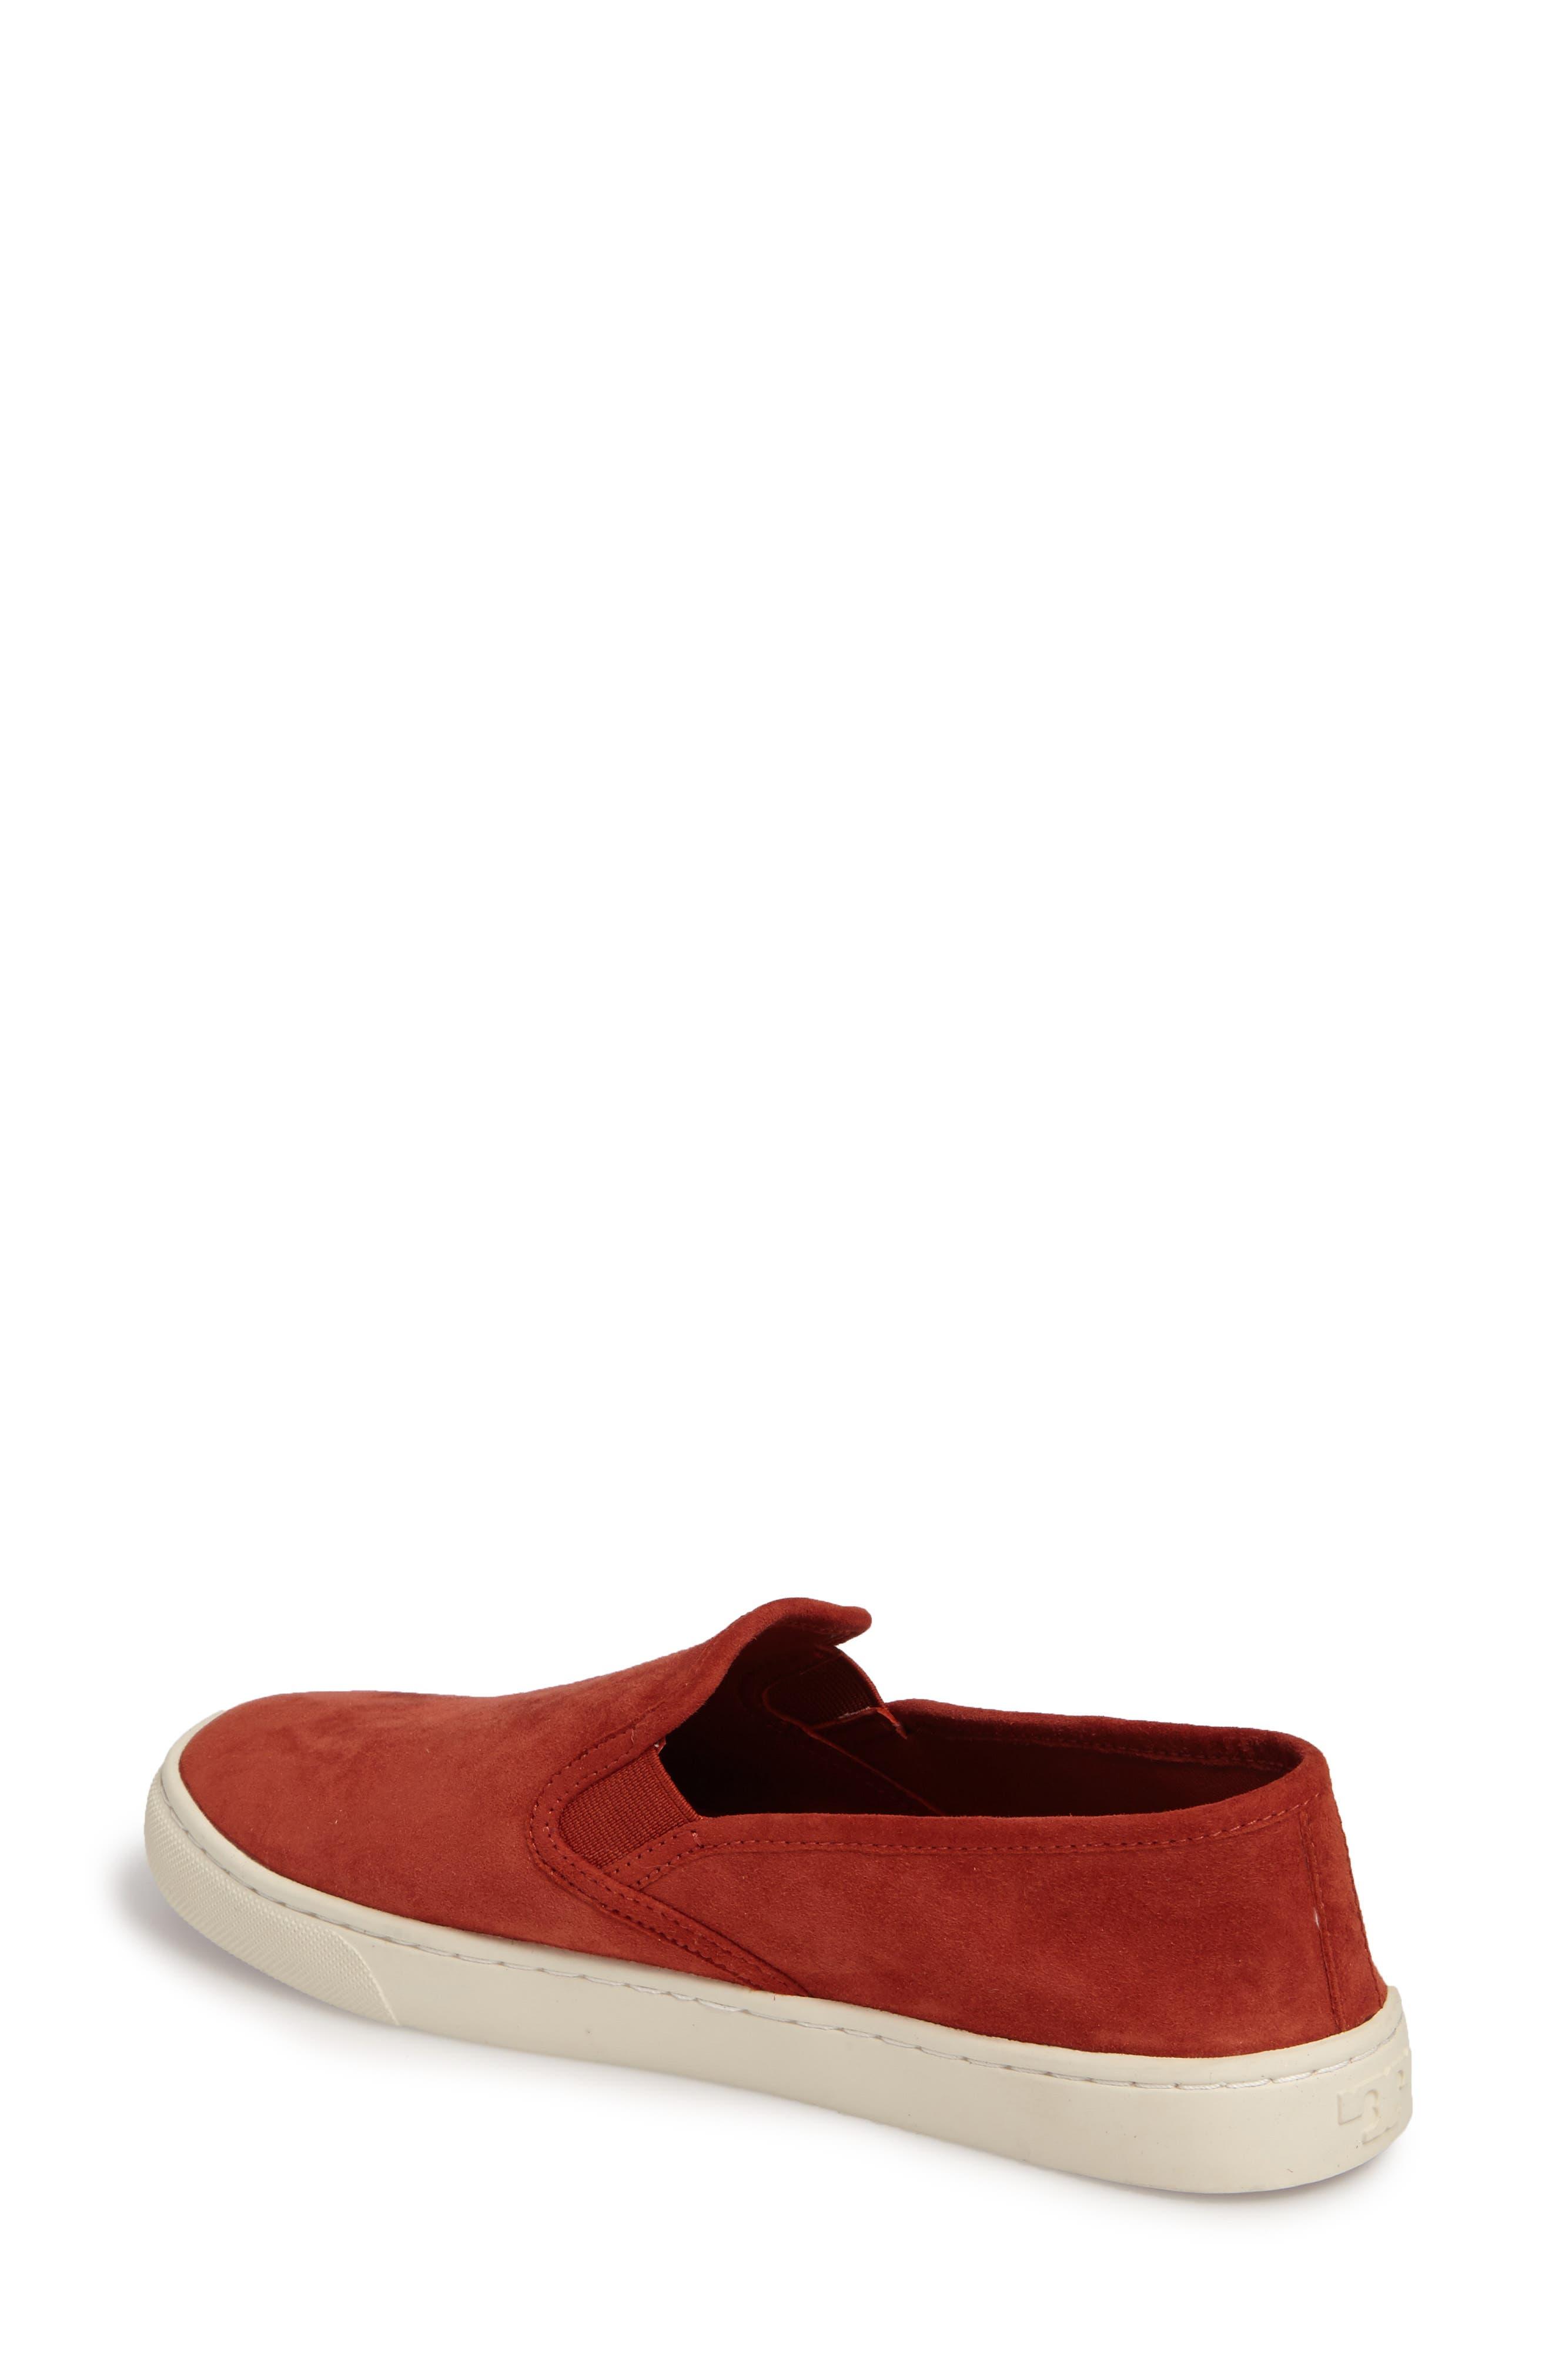 Alternate Image 2  - Tory Burch Max Slip-On Sneaker (Women)